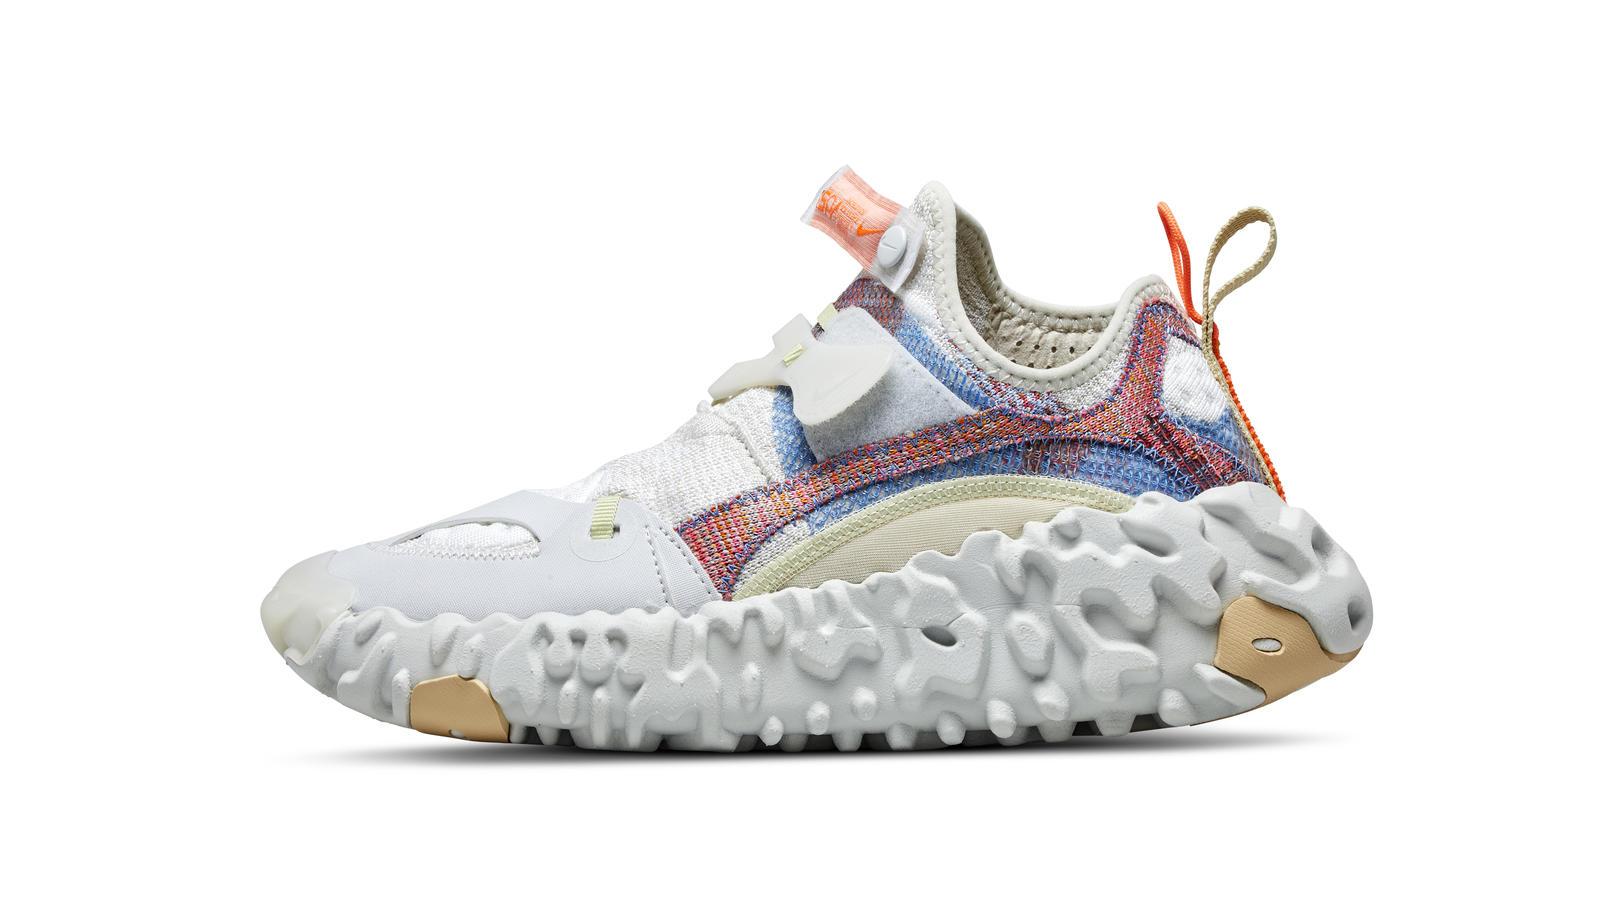 Nike ISPA 2020 Preview 13